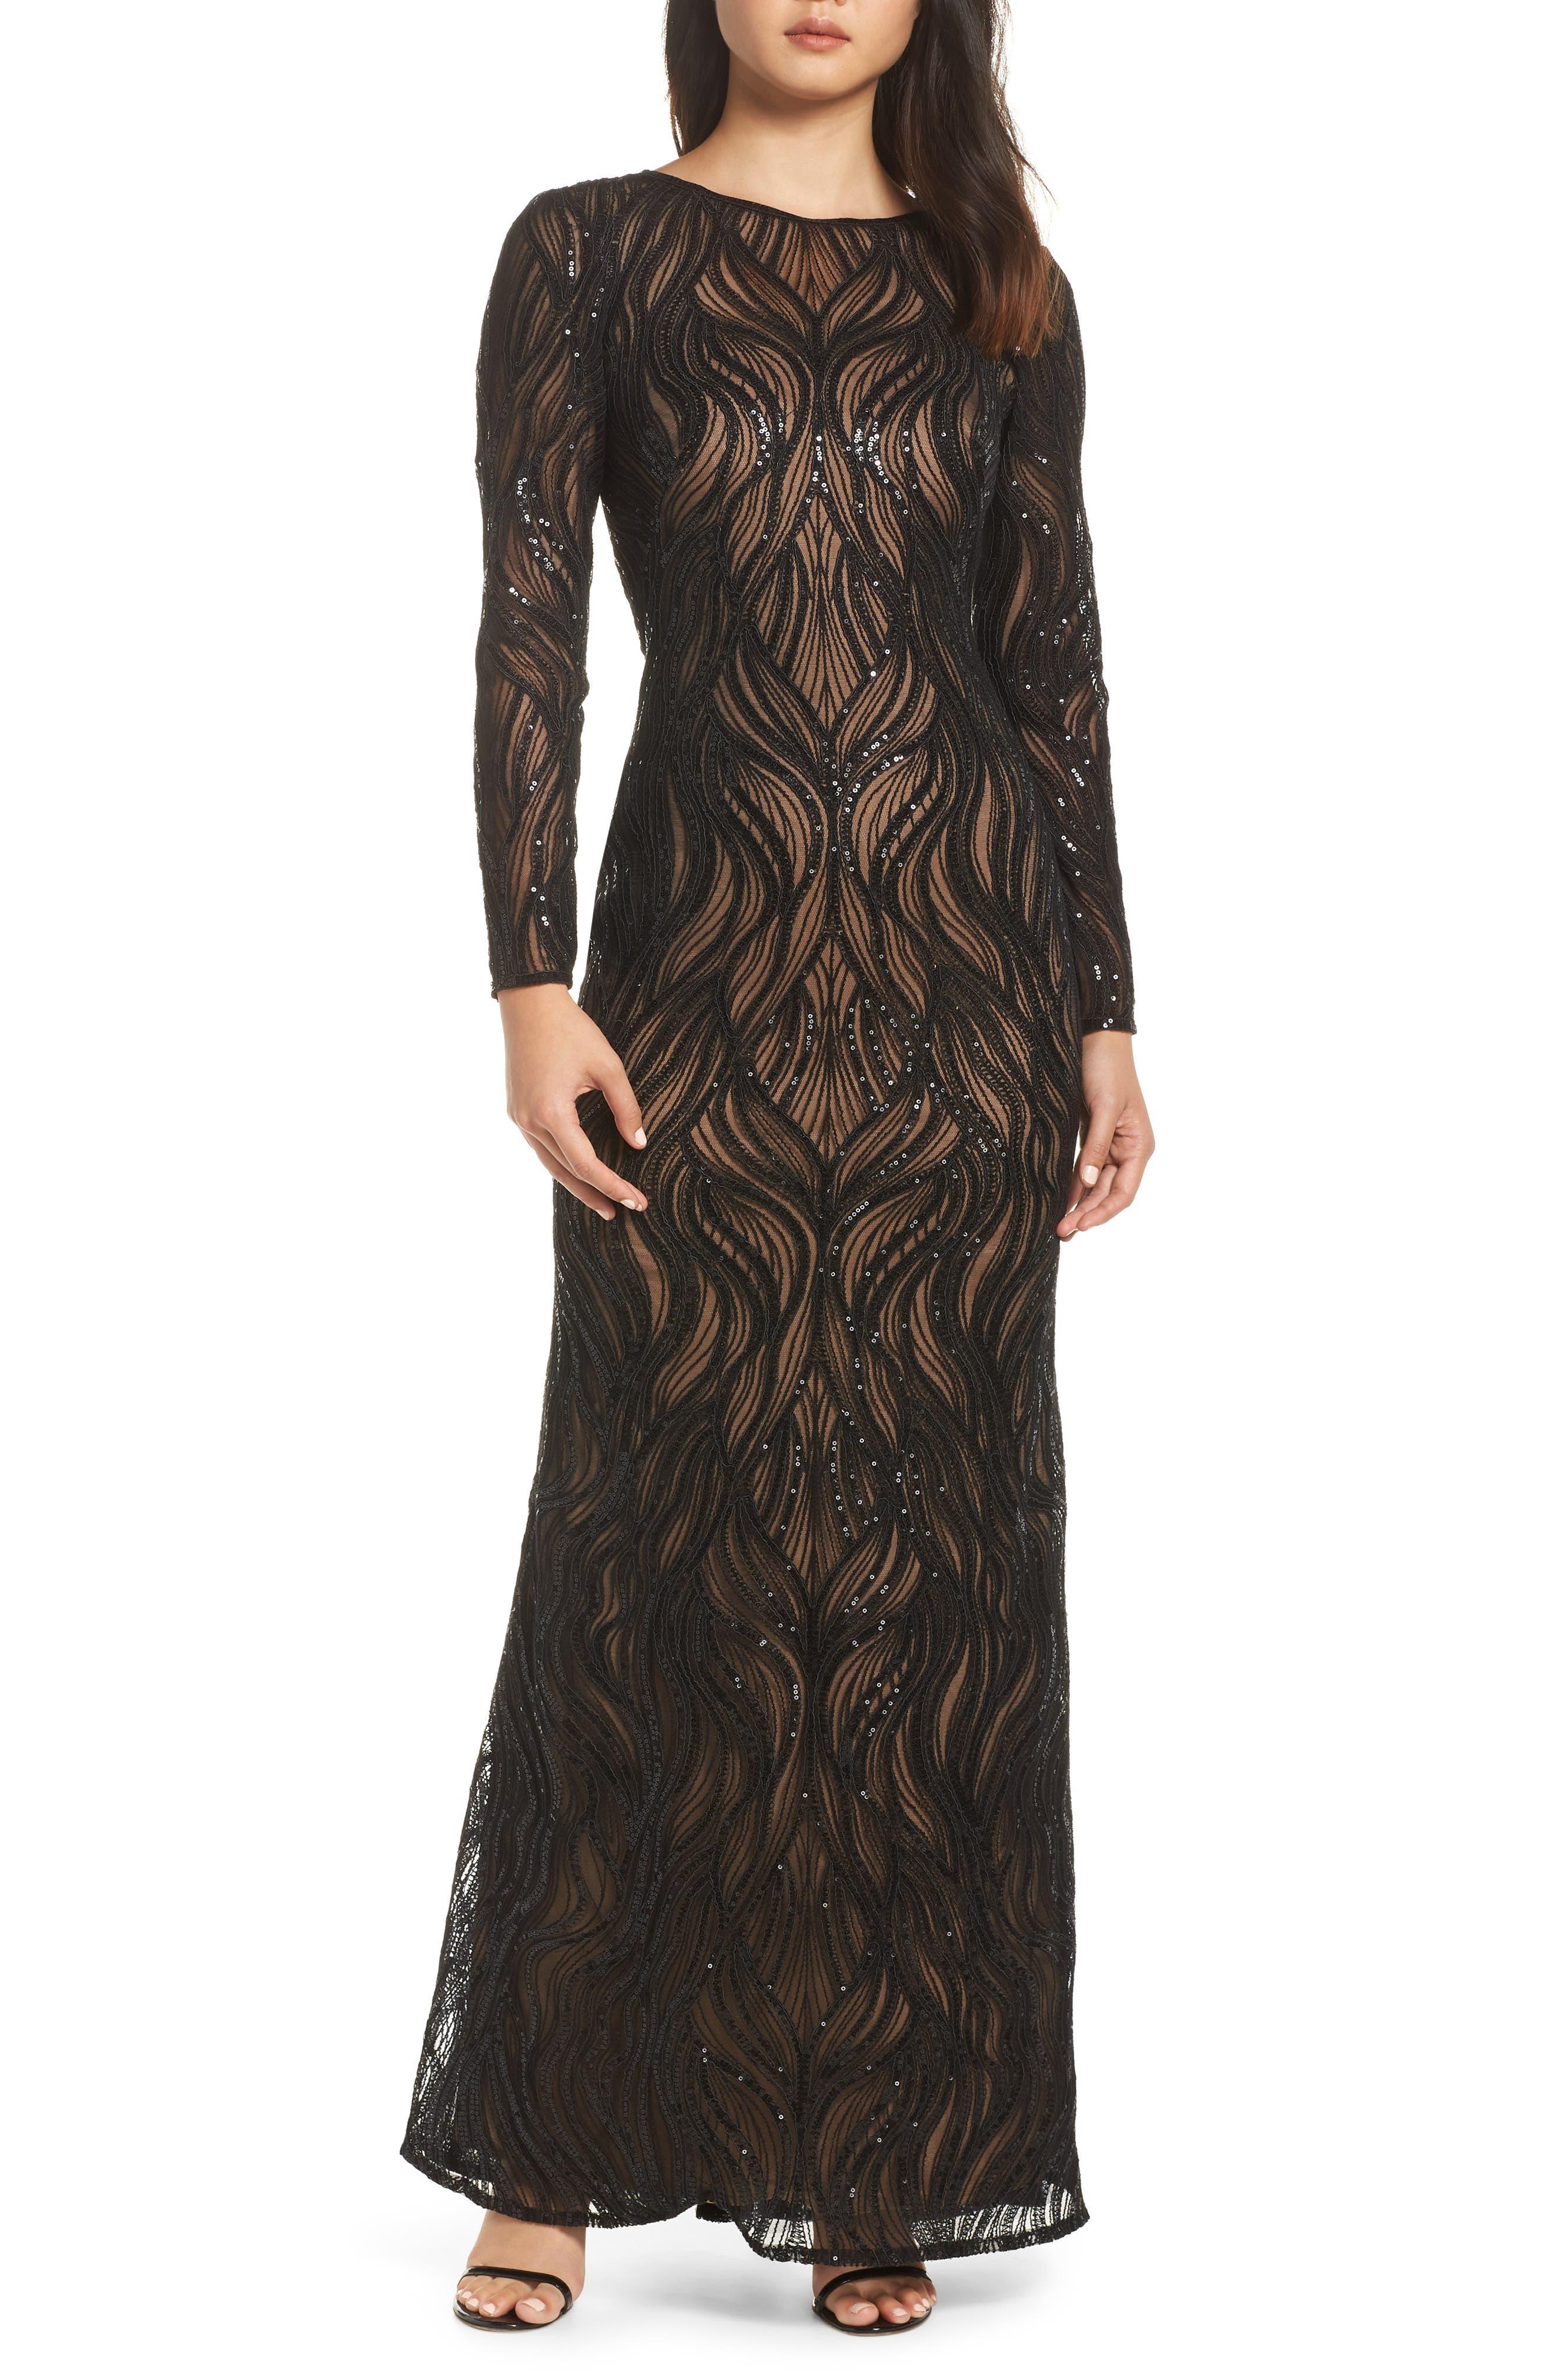 TADASHI SHOJI, Long Sleeve Sequined Mesh Evening Dress, Main thumbnail 1, color, 001